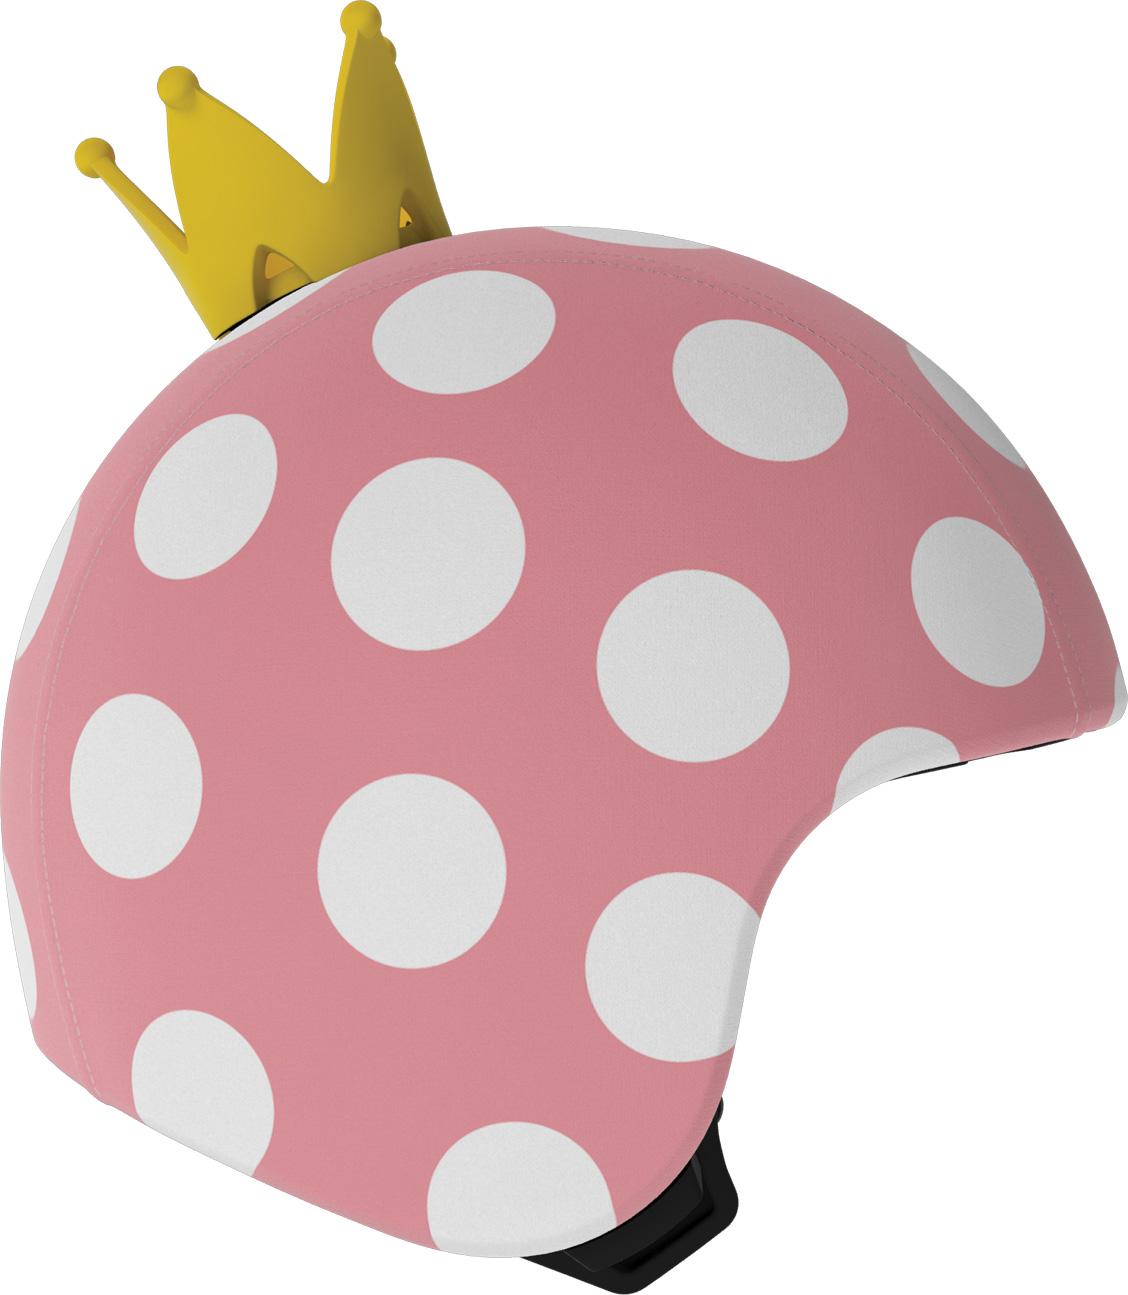 DOROTHY-princess-SIDE